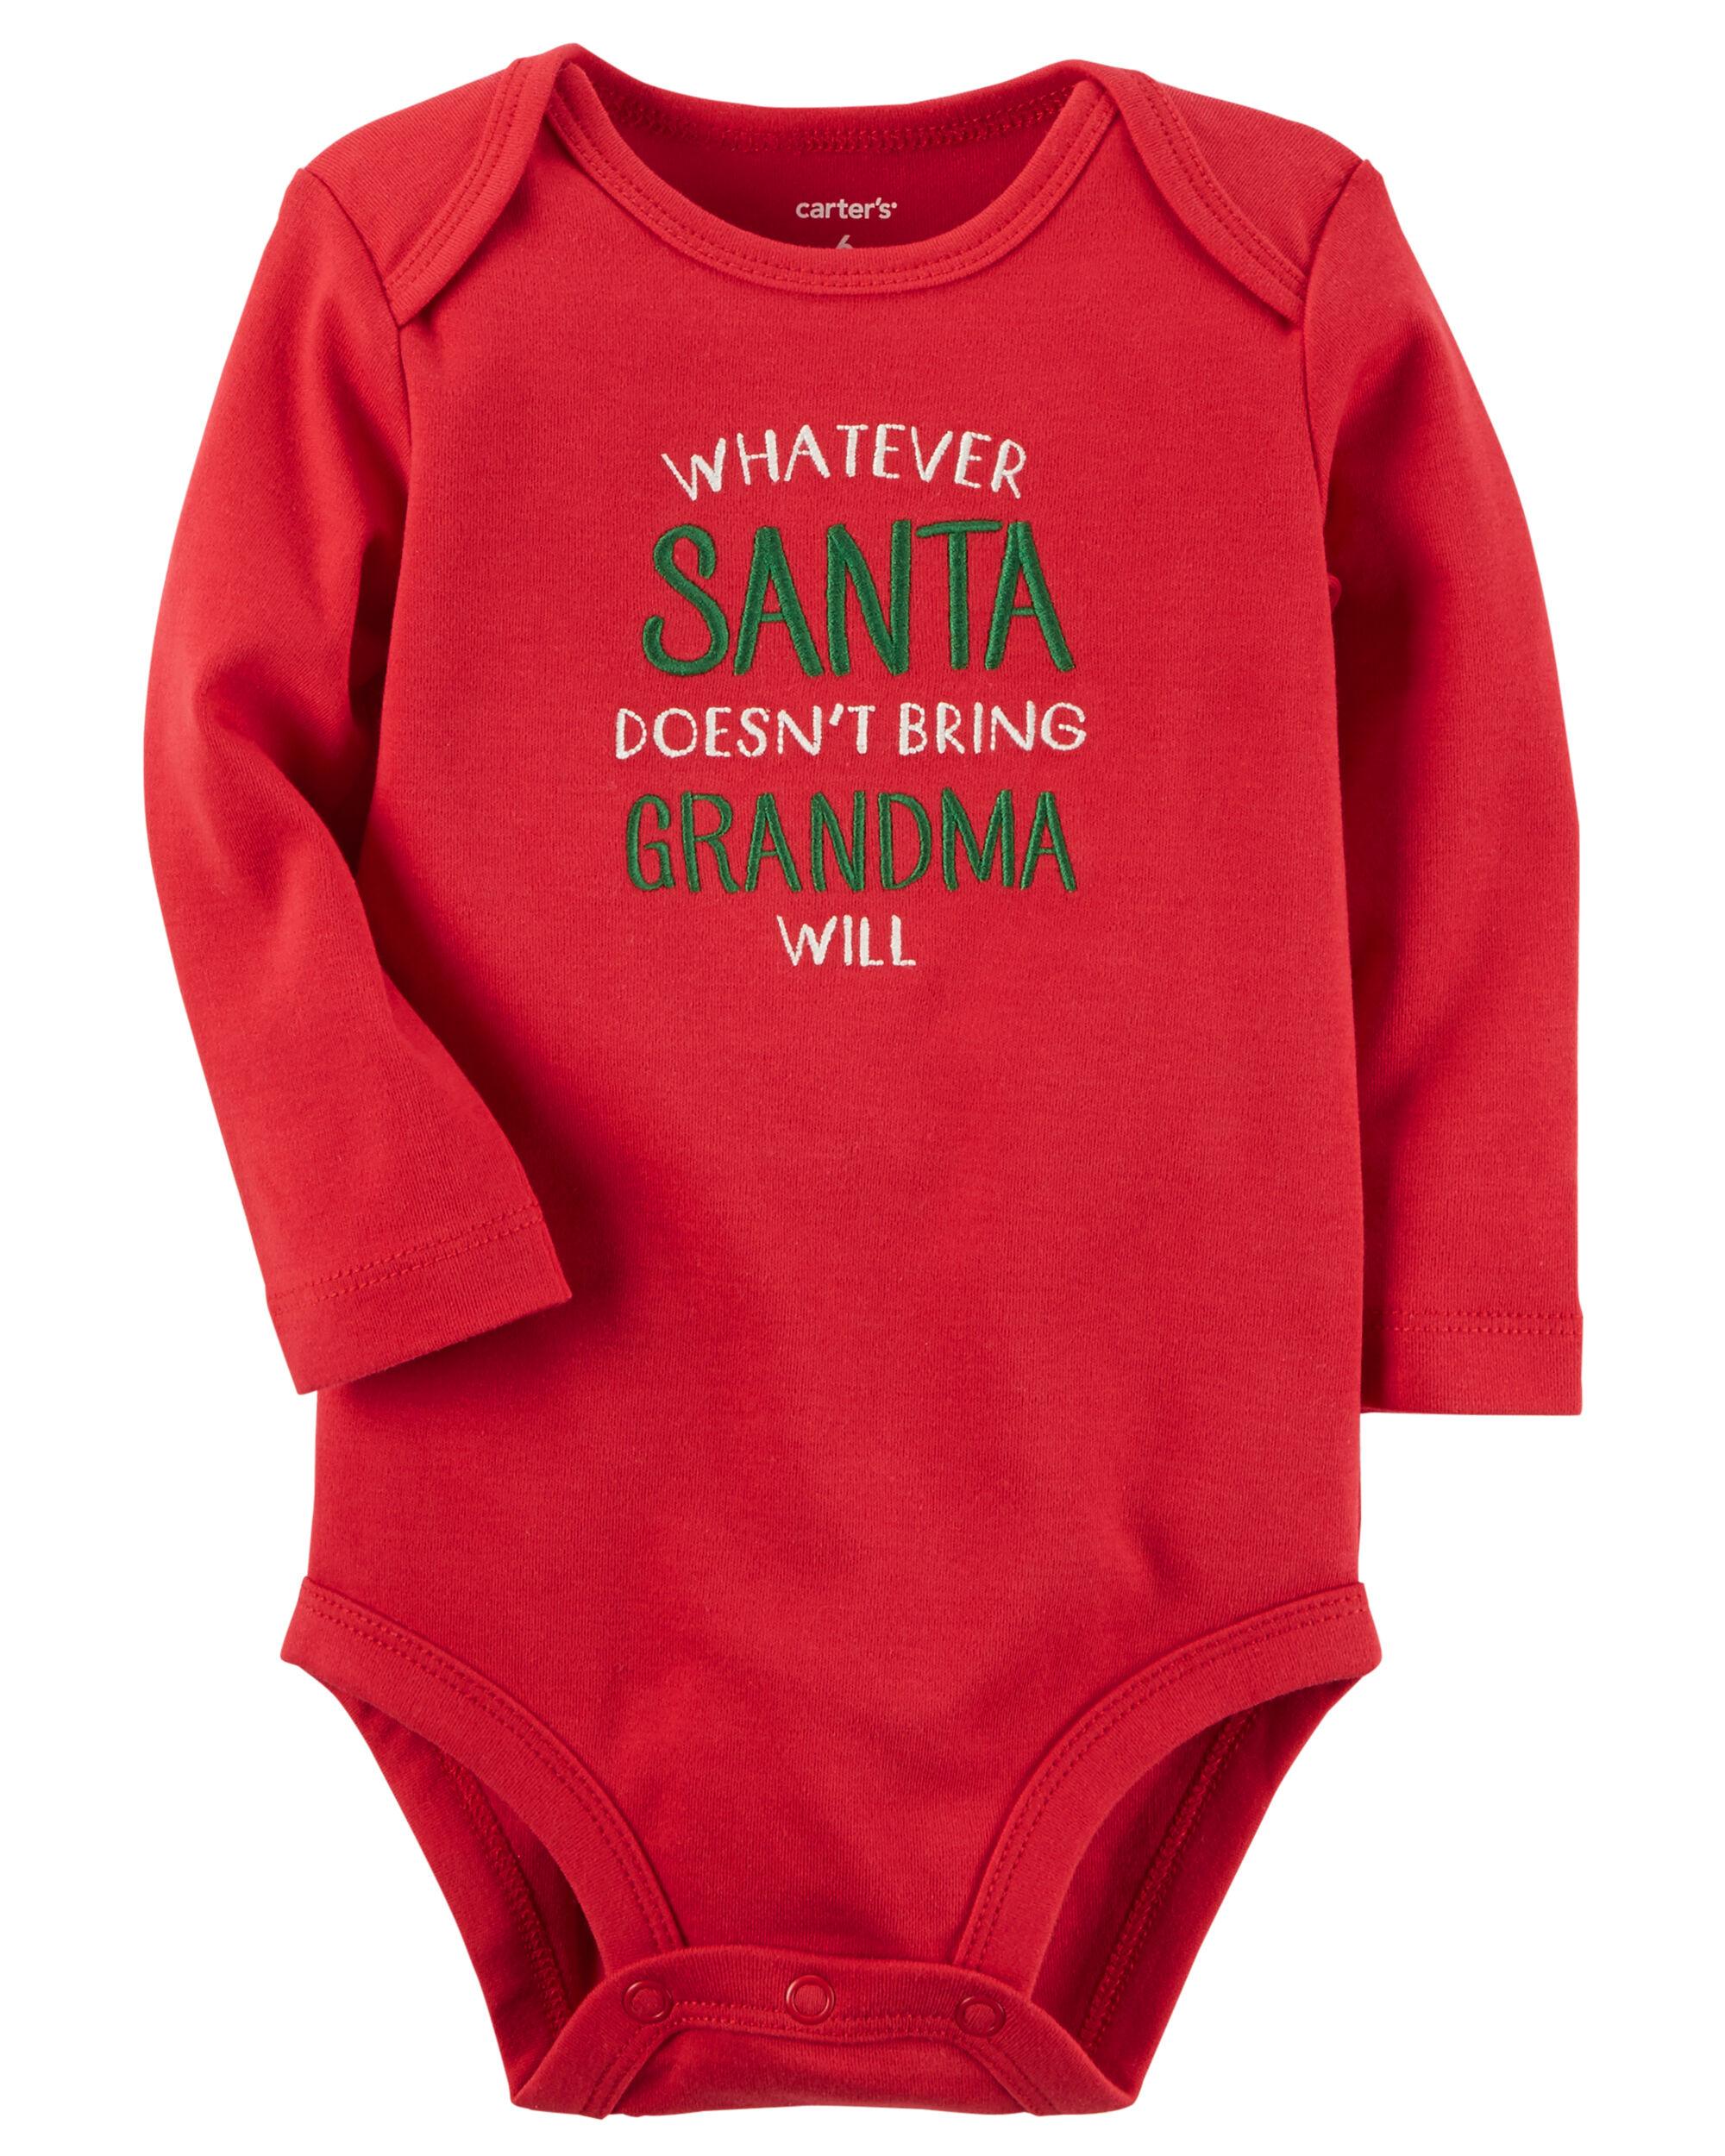 Santa and Grandma Collectible Bodysuit